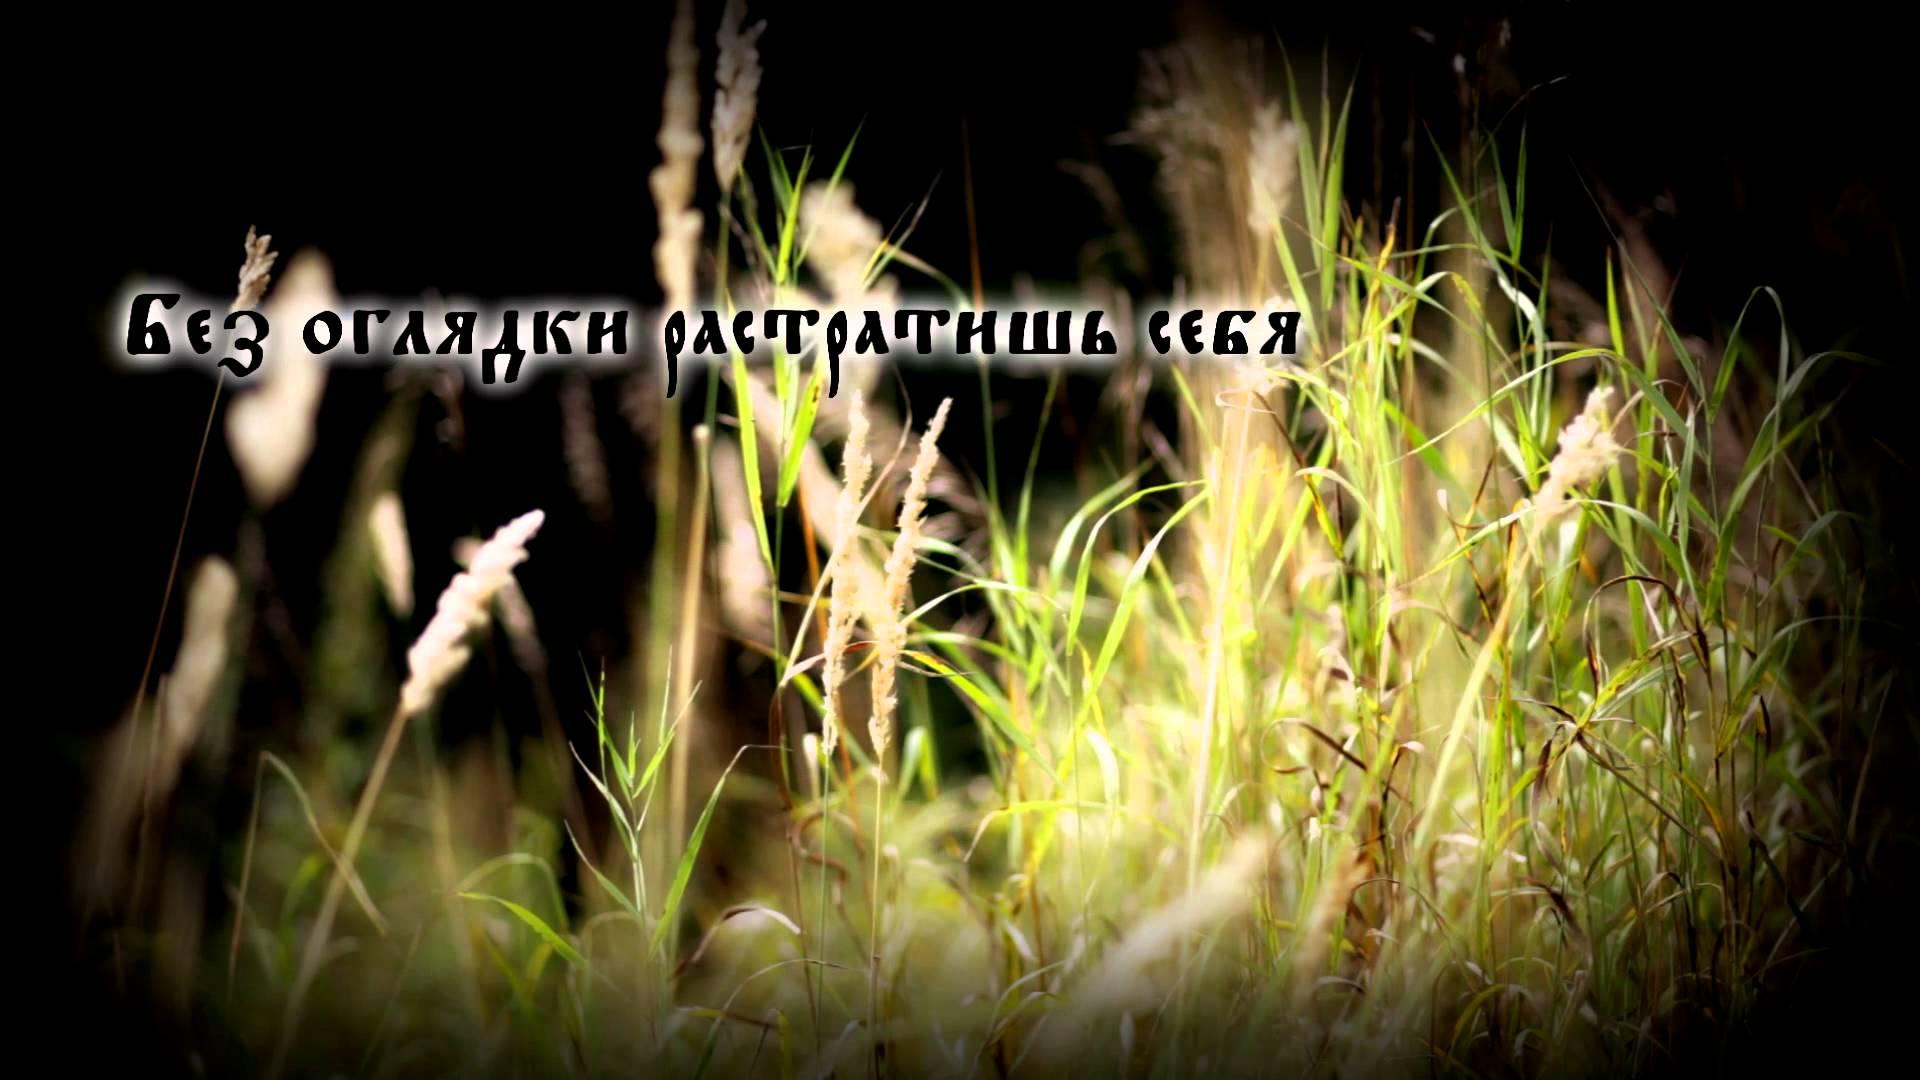 Butterfly Temple Останься со мной lyric video 2014